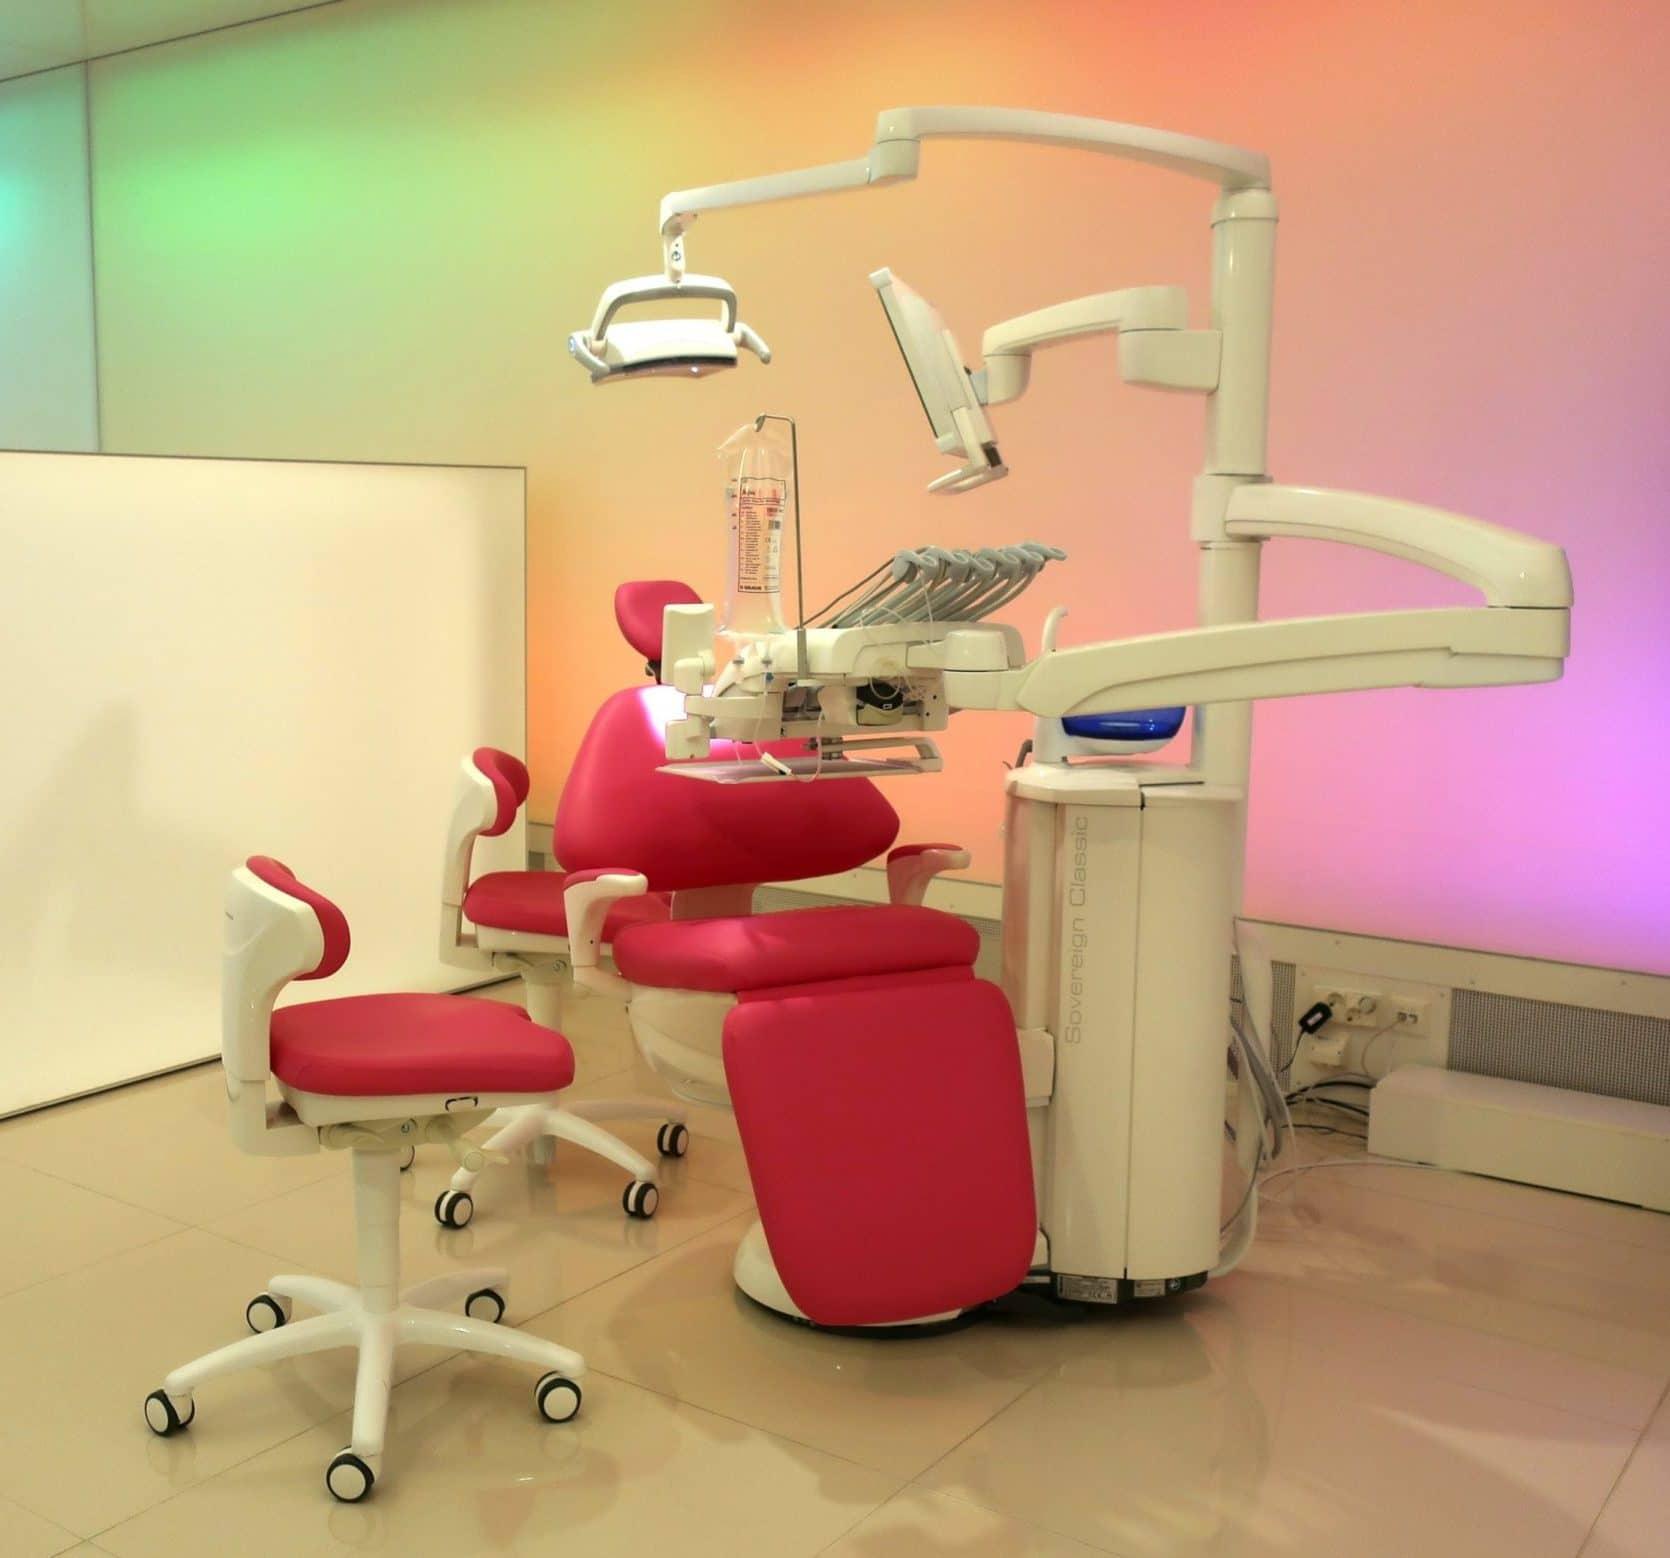 Medical Device Planmeca Dental 6